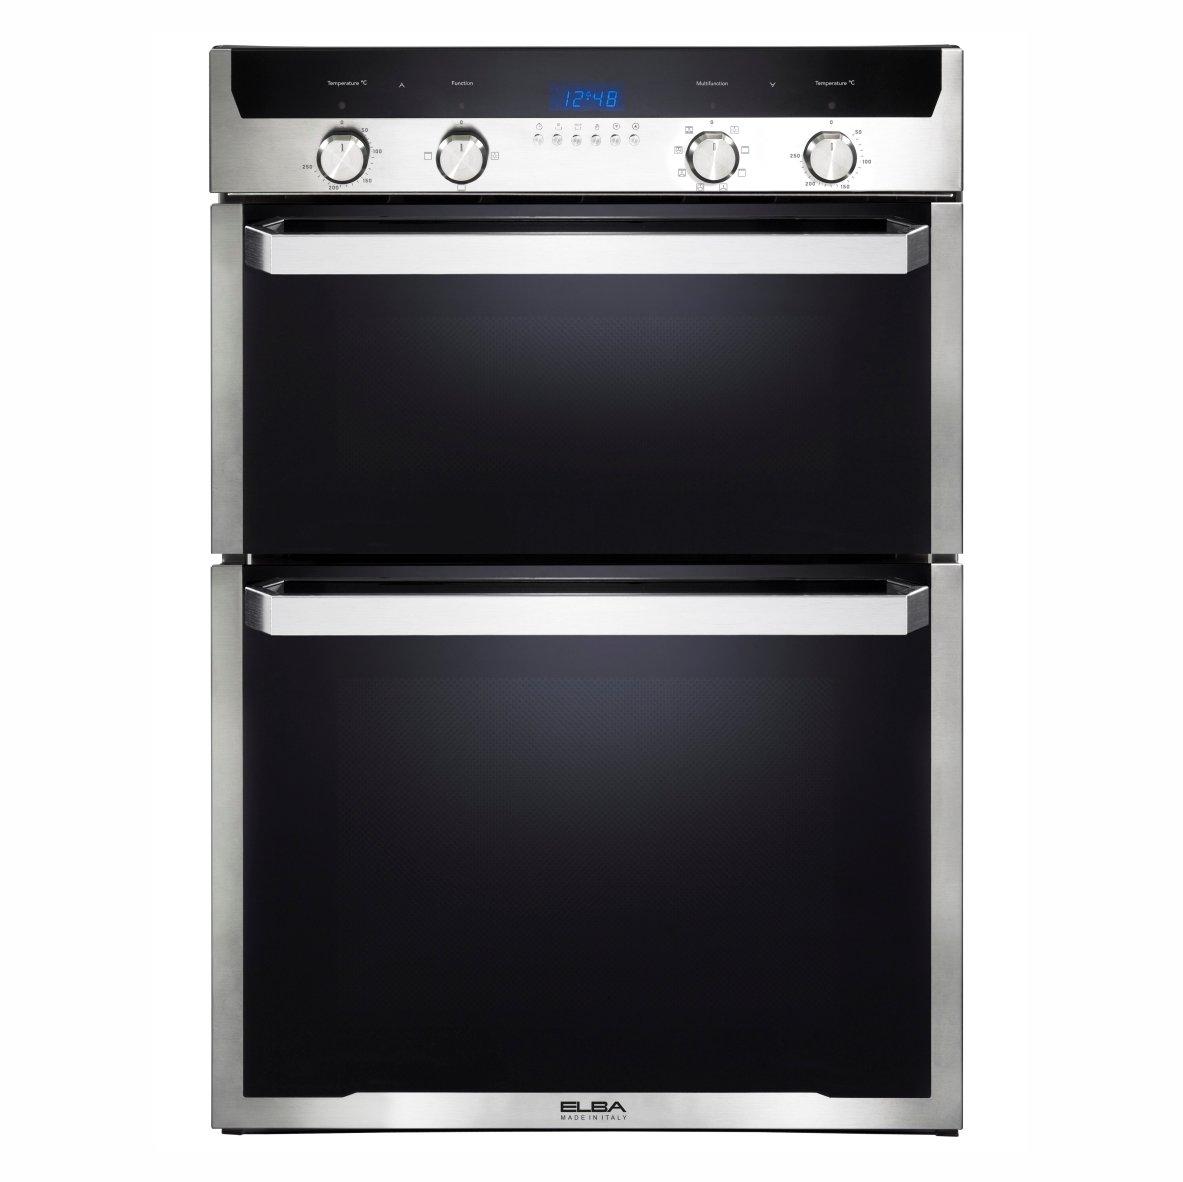 Elba double electric oven